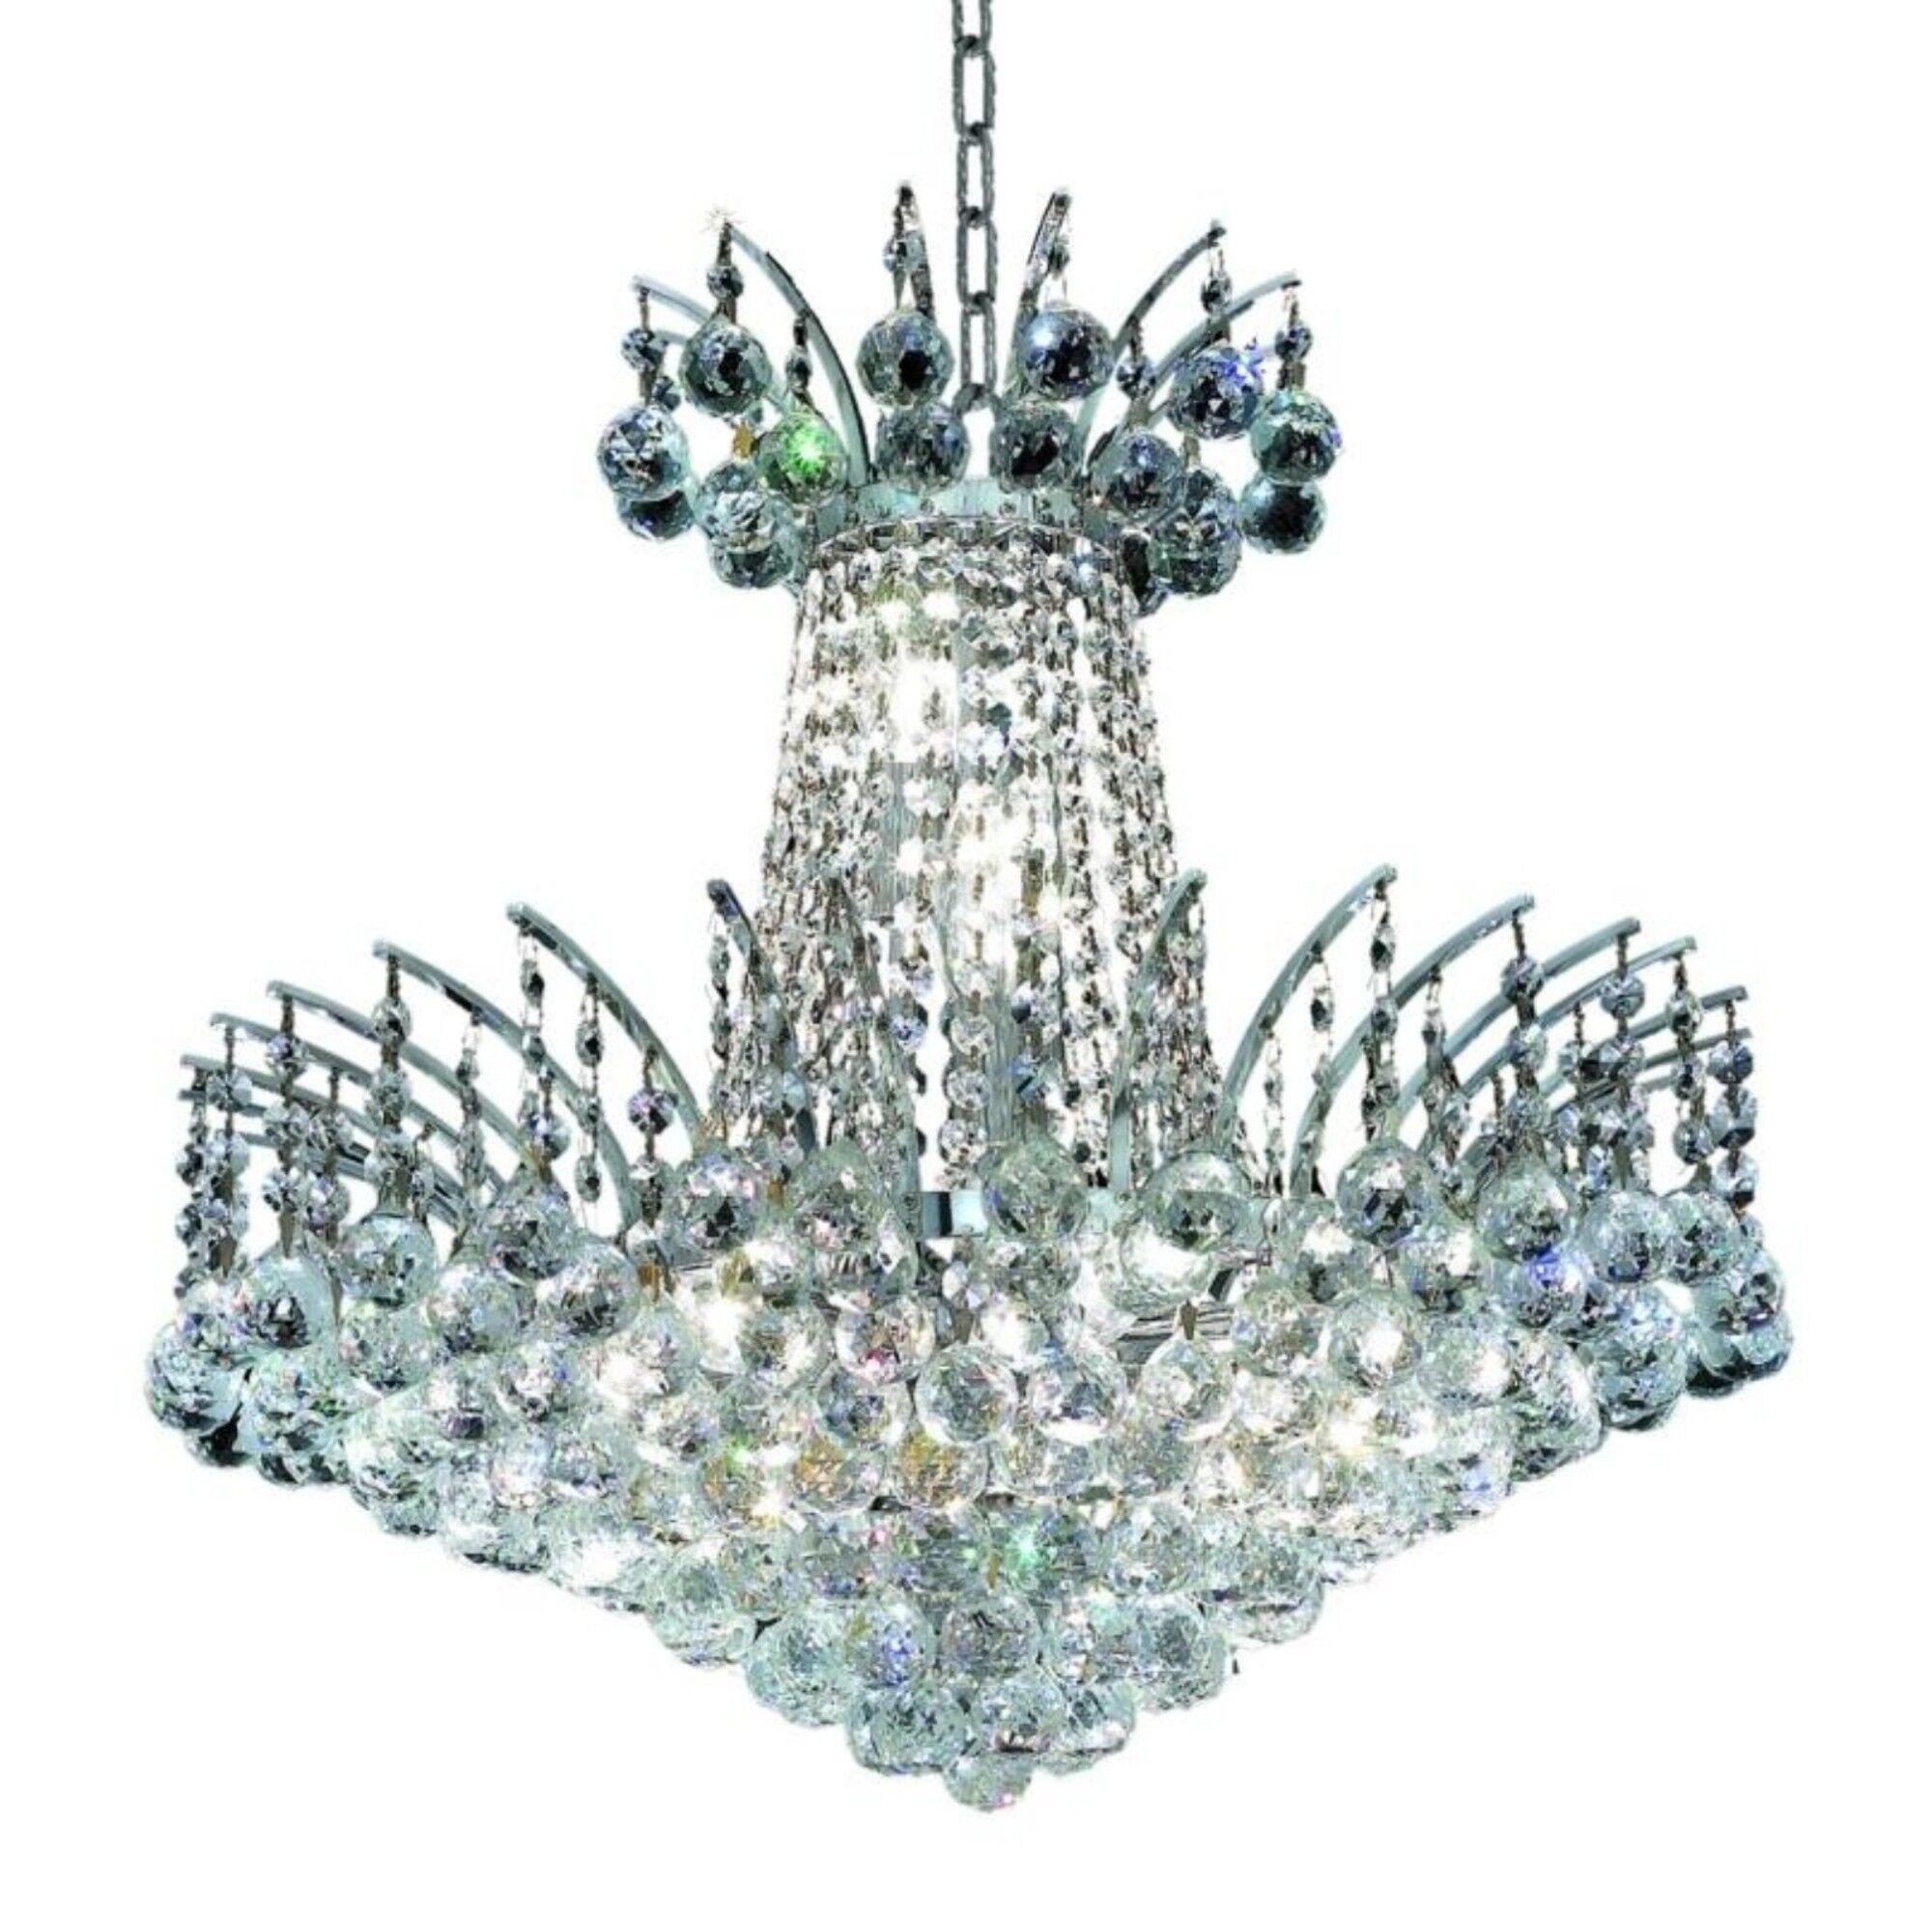 Phyllida 8-Light Empire Chandelier Finish: Chrome, Crystal: Spectra Swarovski